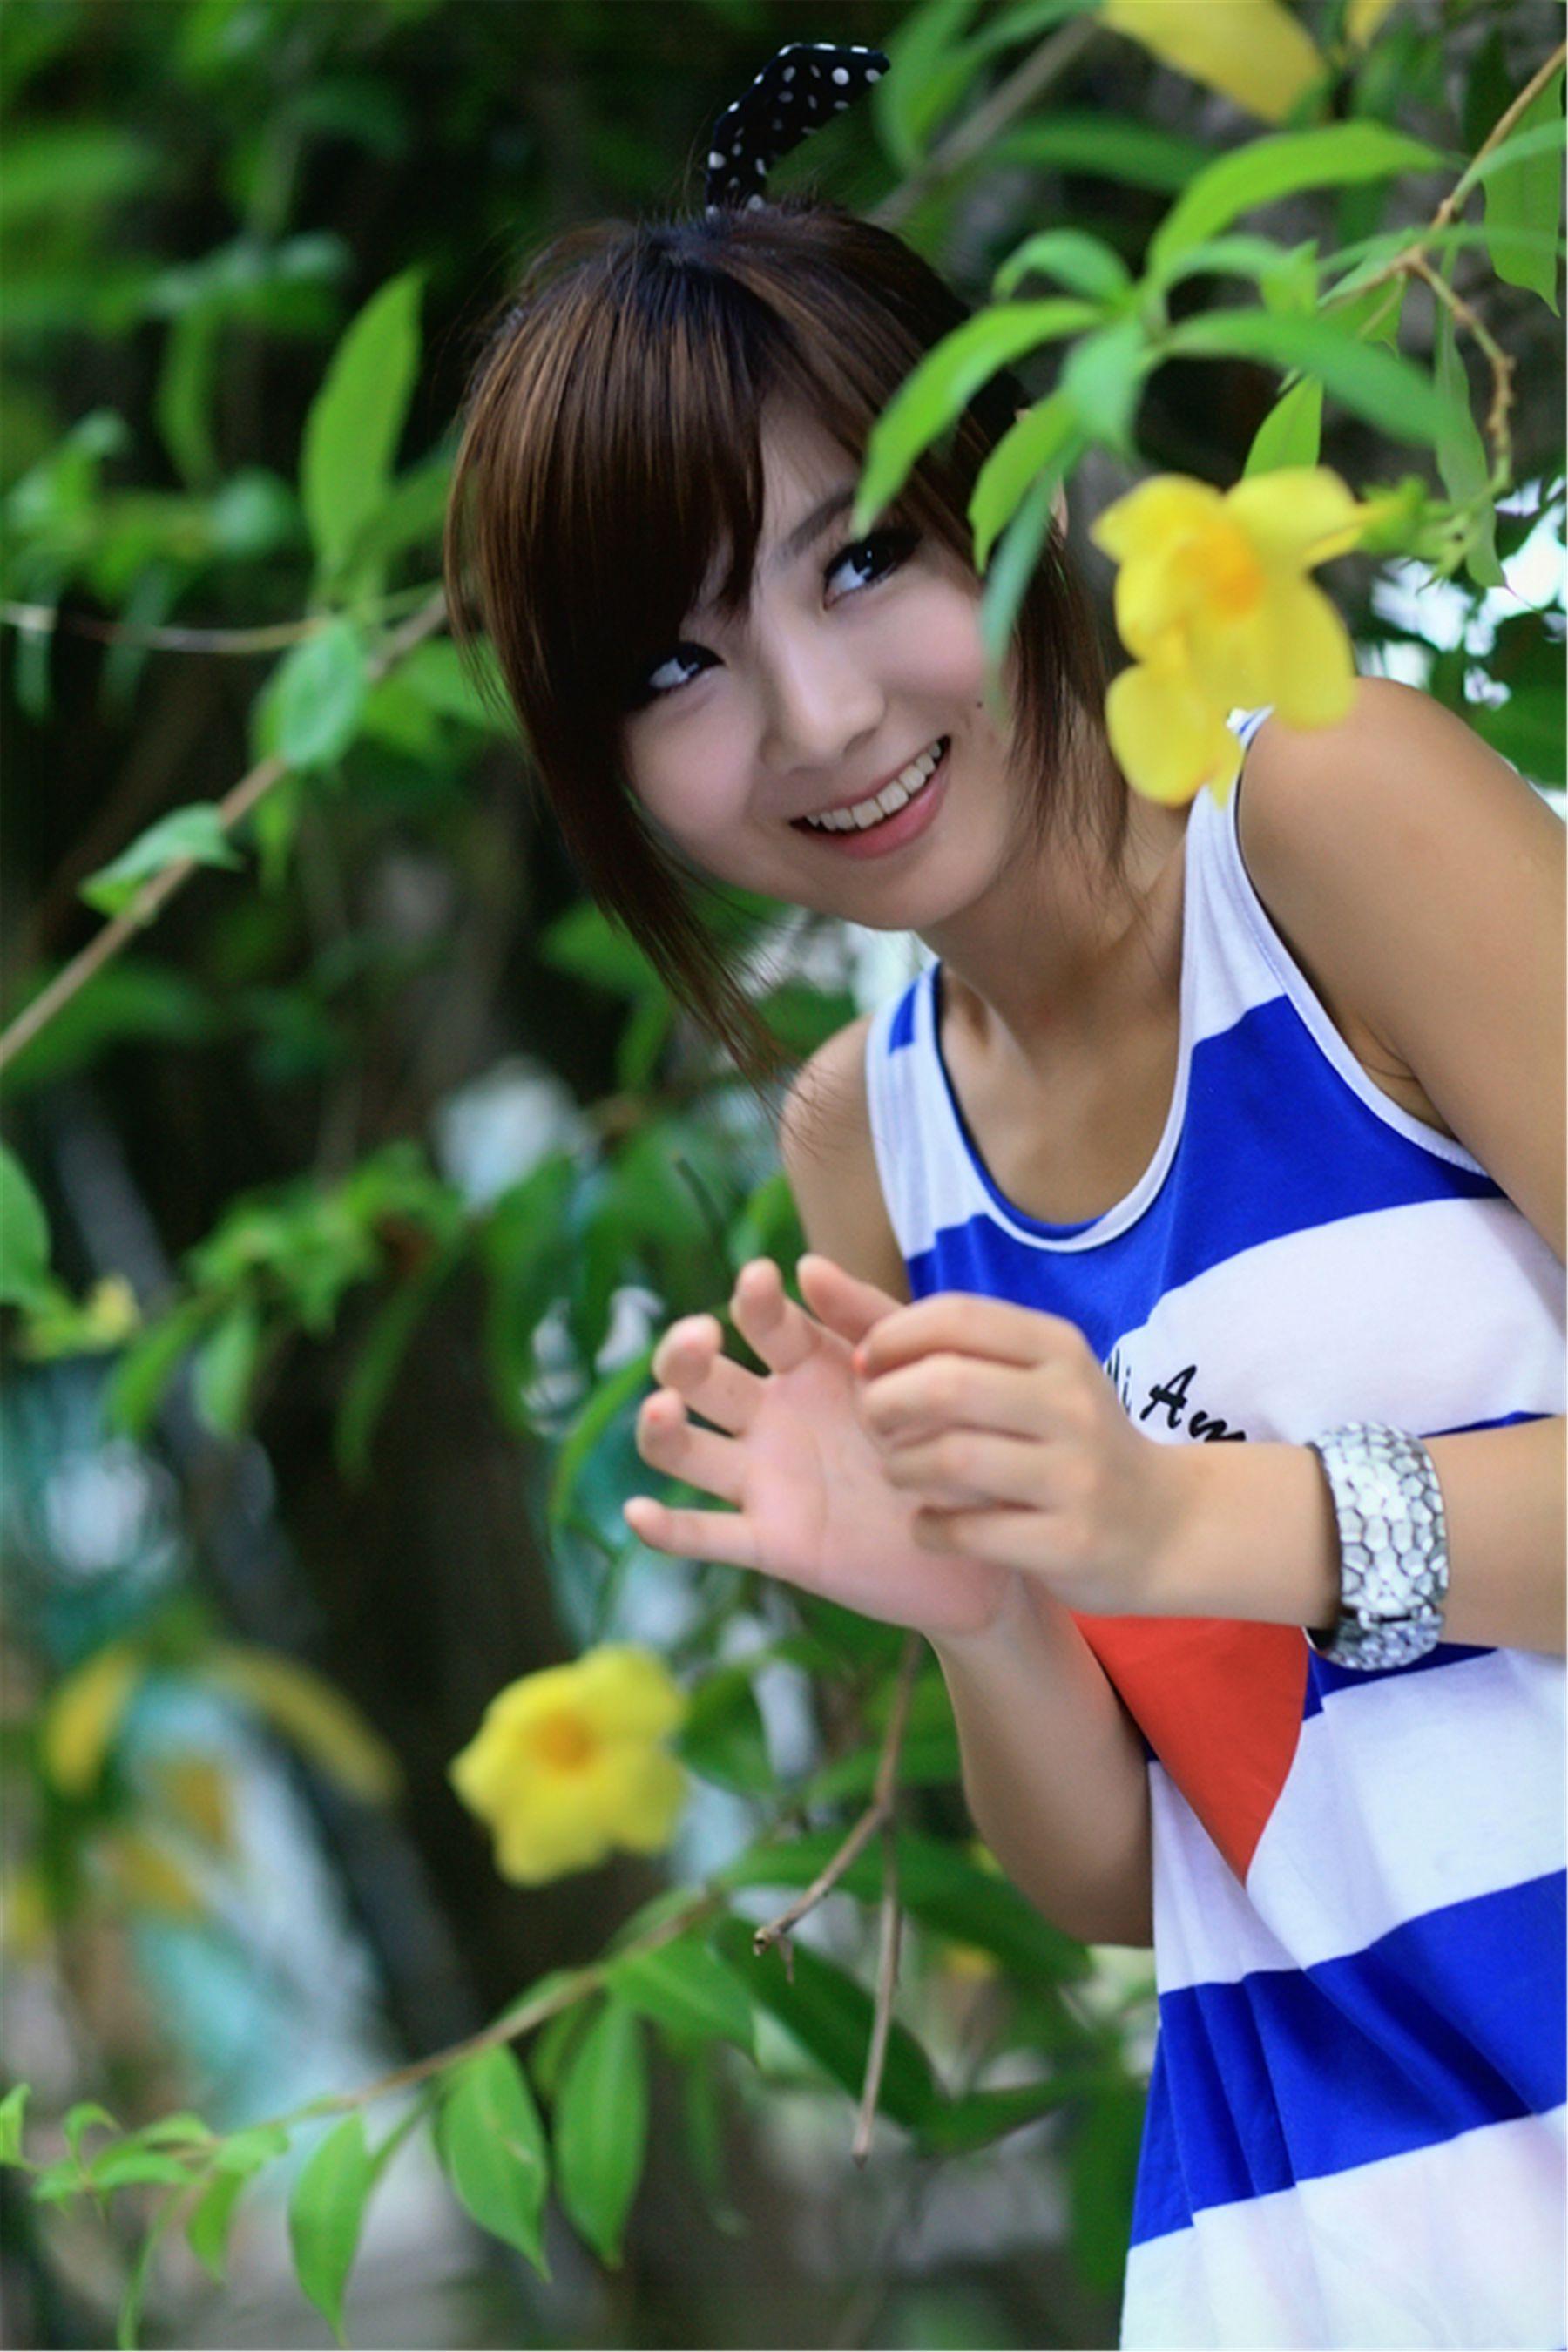 VOL.680 [台湾正妹]清纯甜美清新正妹B罩杯美女:杨宜轩(Patty小猪)高品质写真套图(37P)